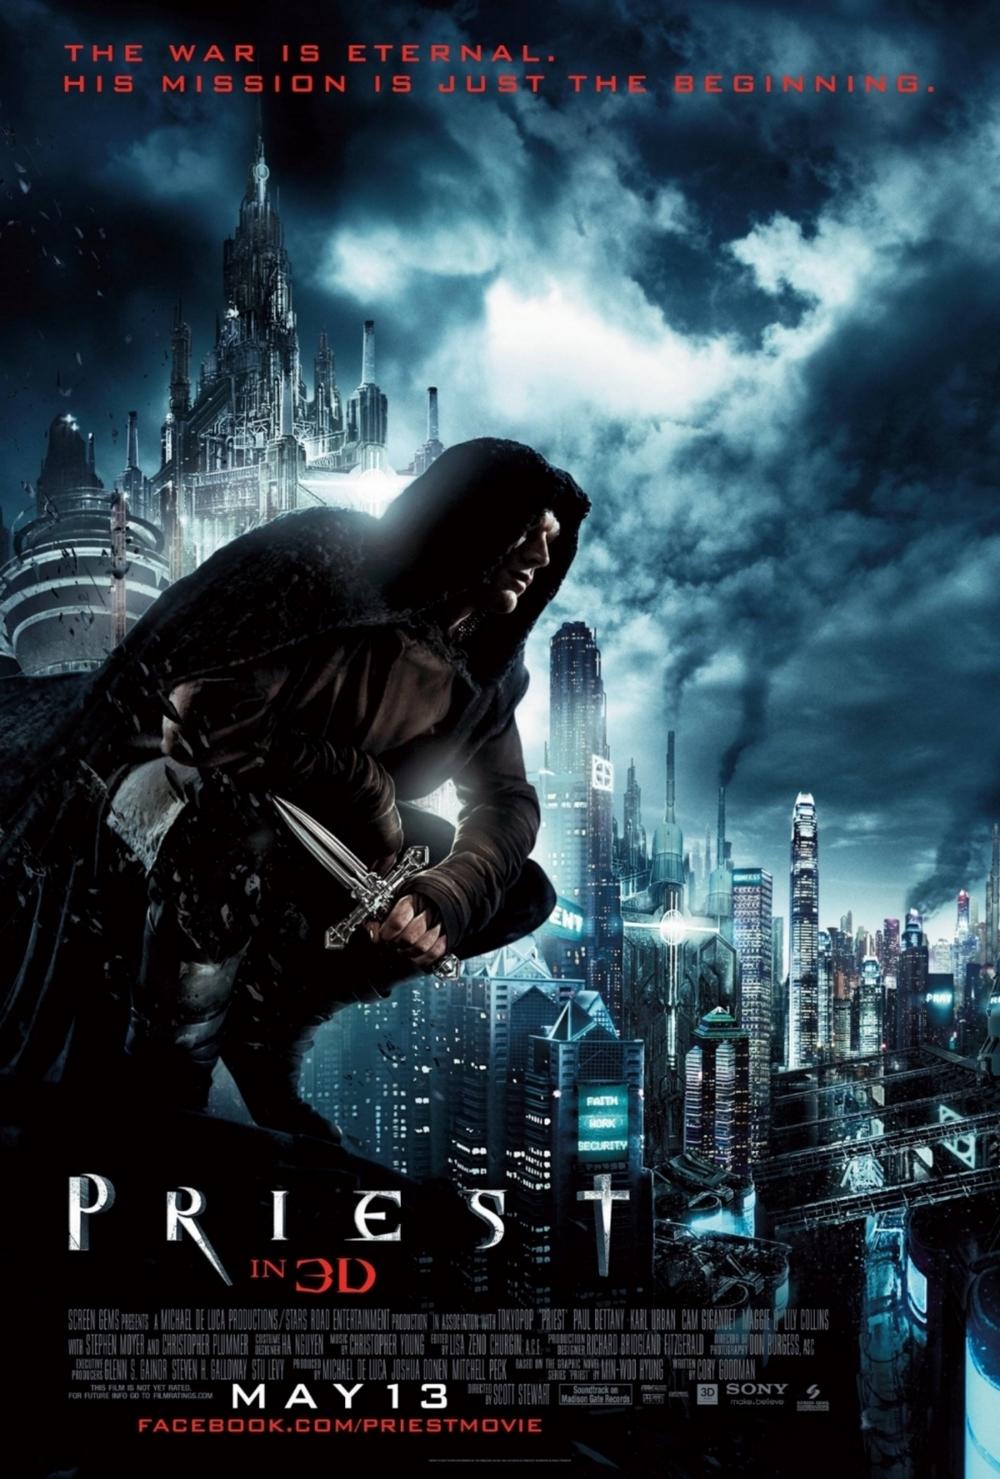 Priest Poster.jpg